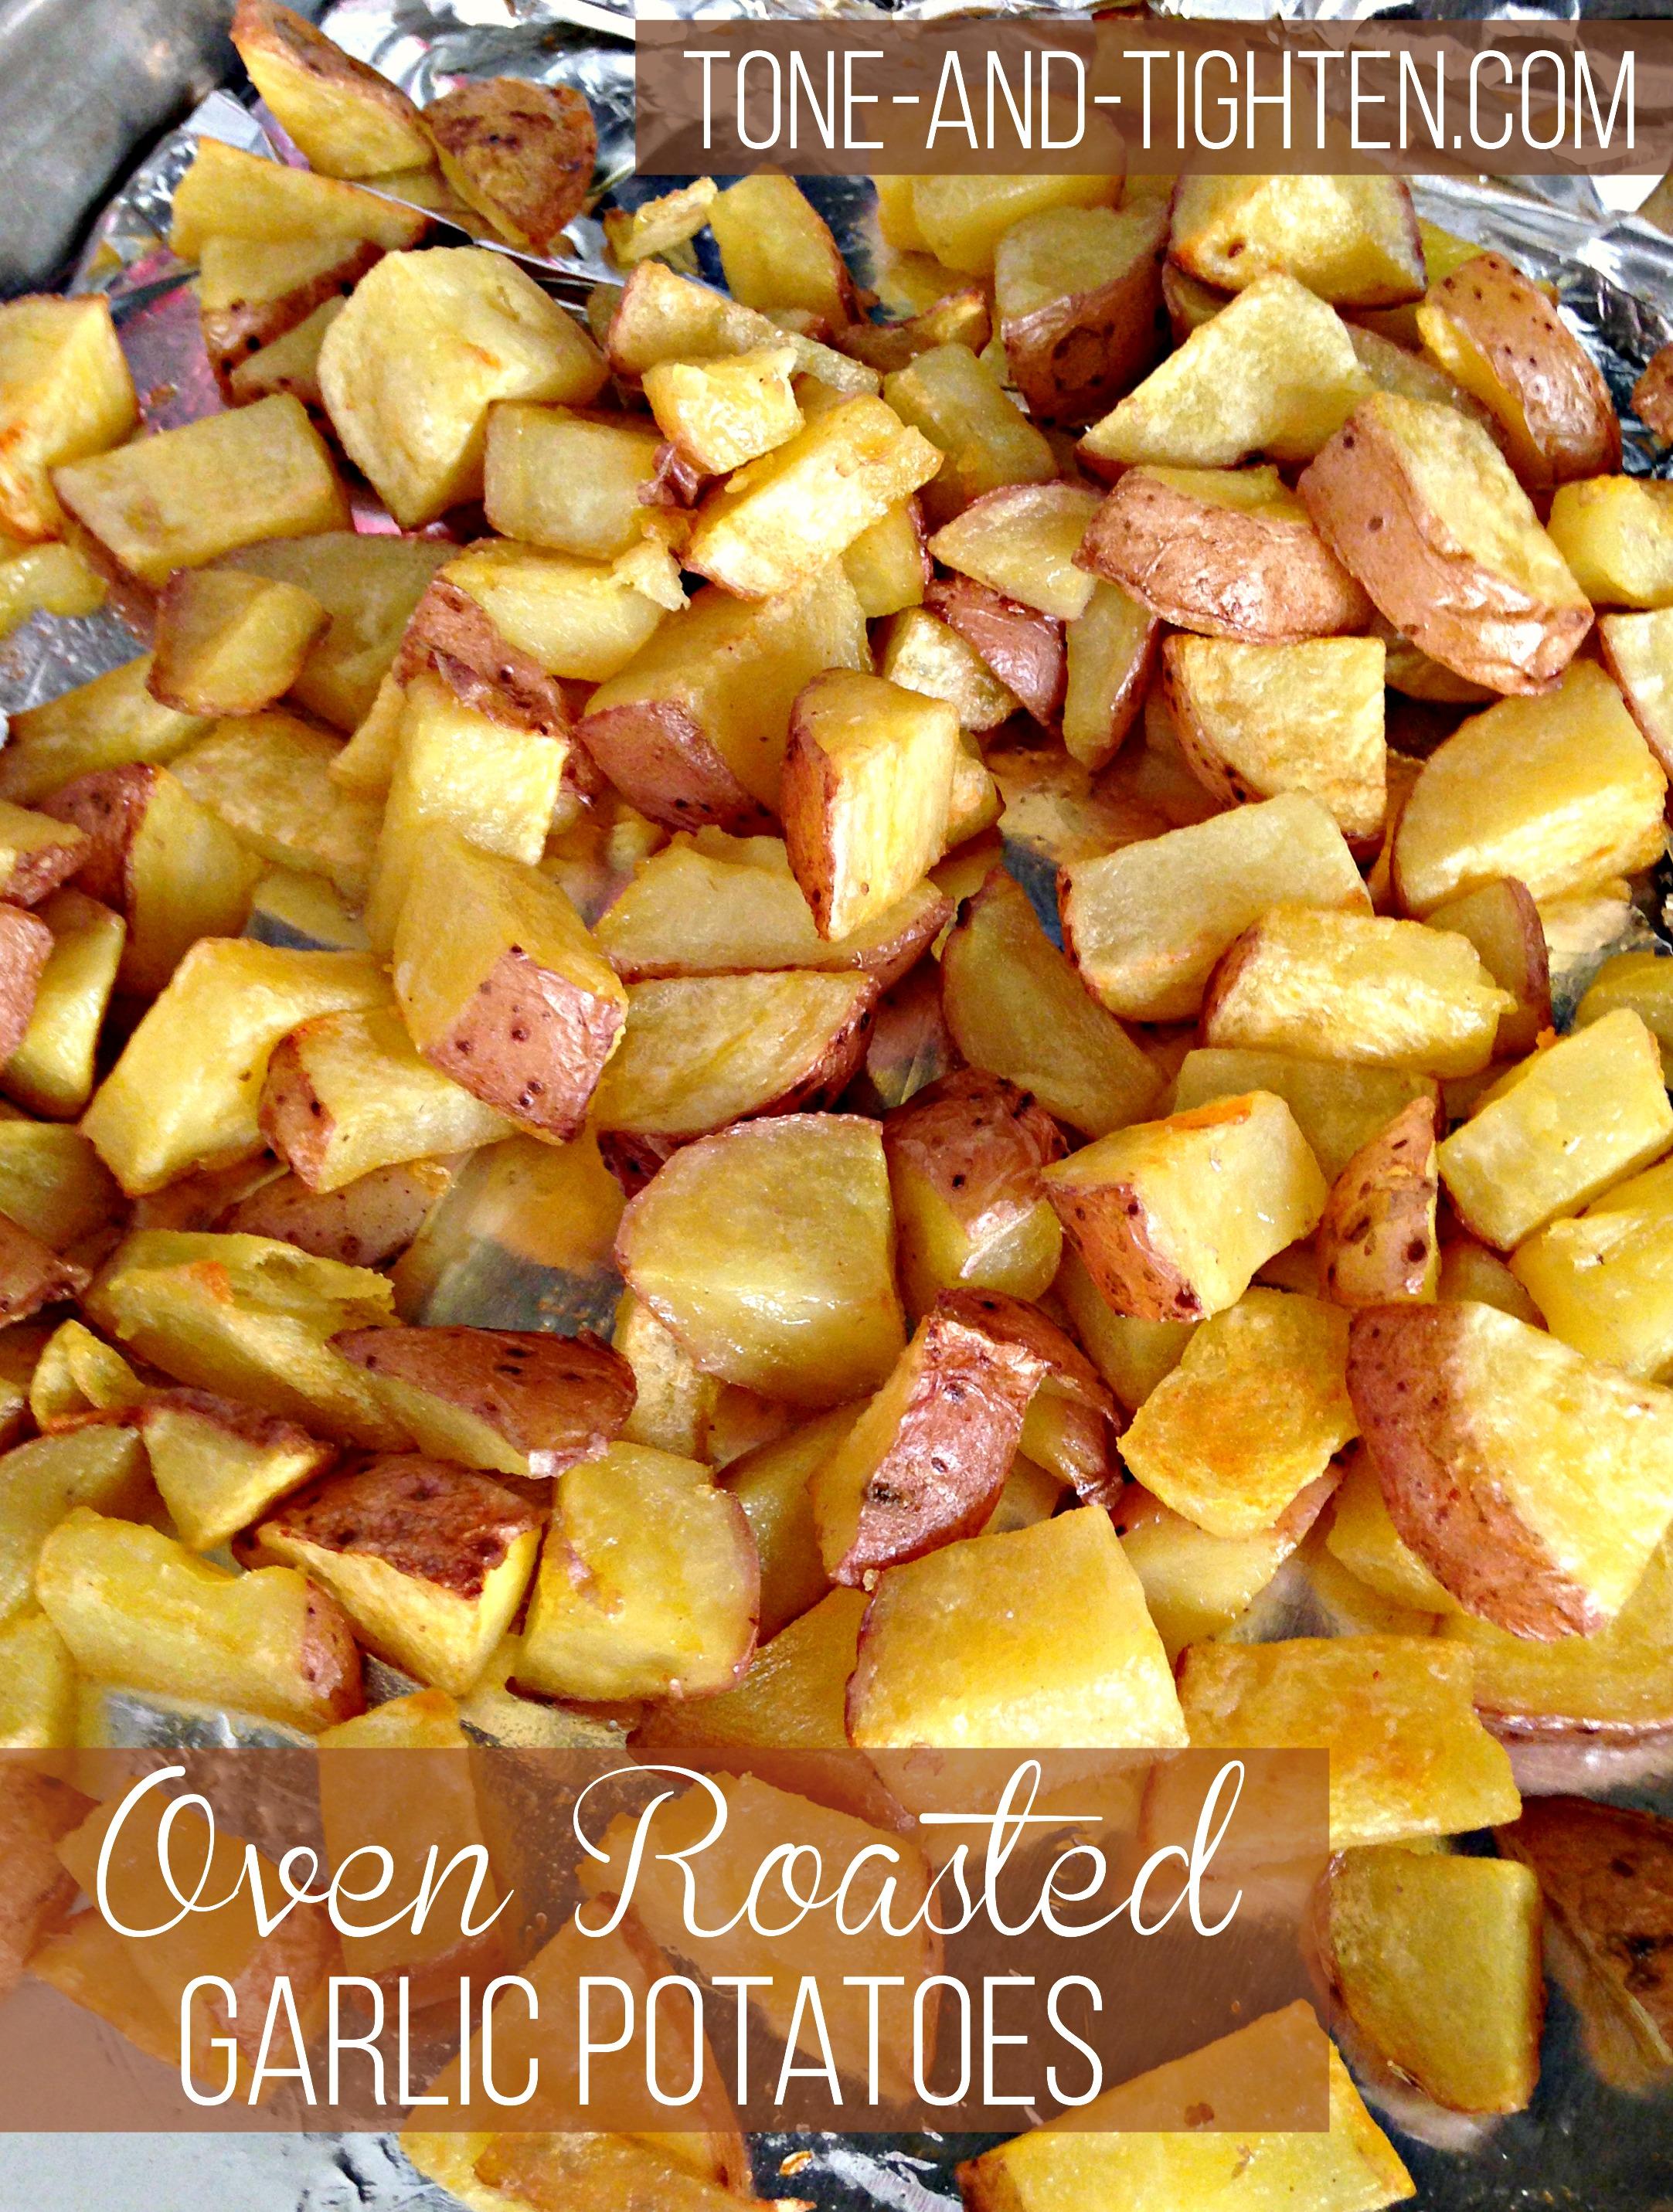 Roasted Garlic Potatoes | Tone and Tighten